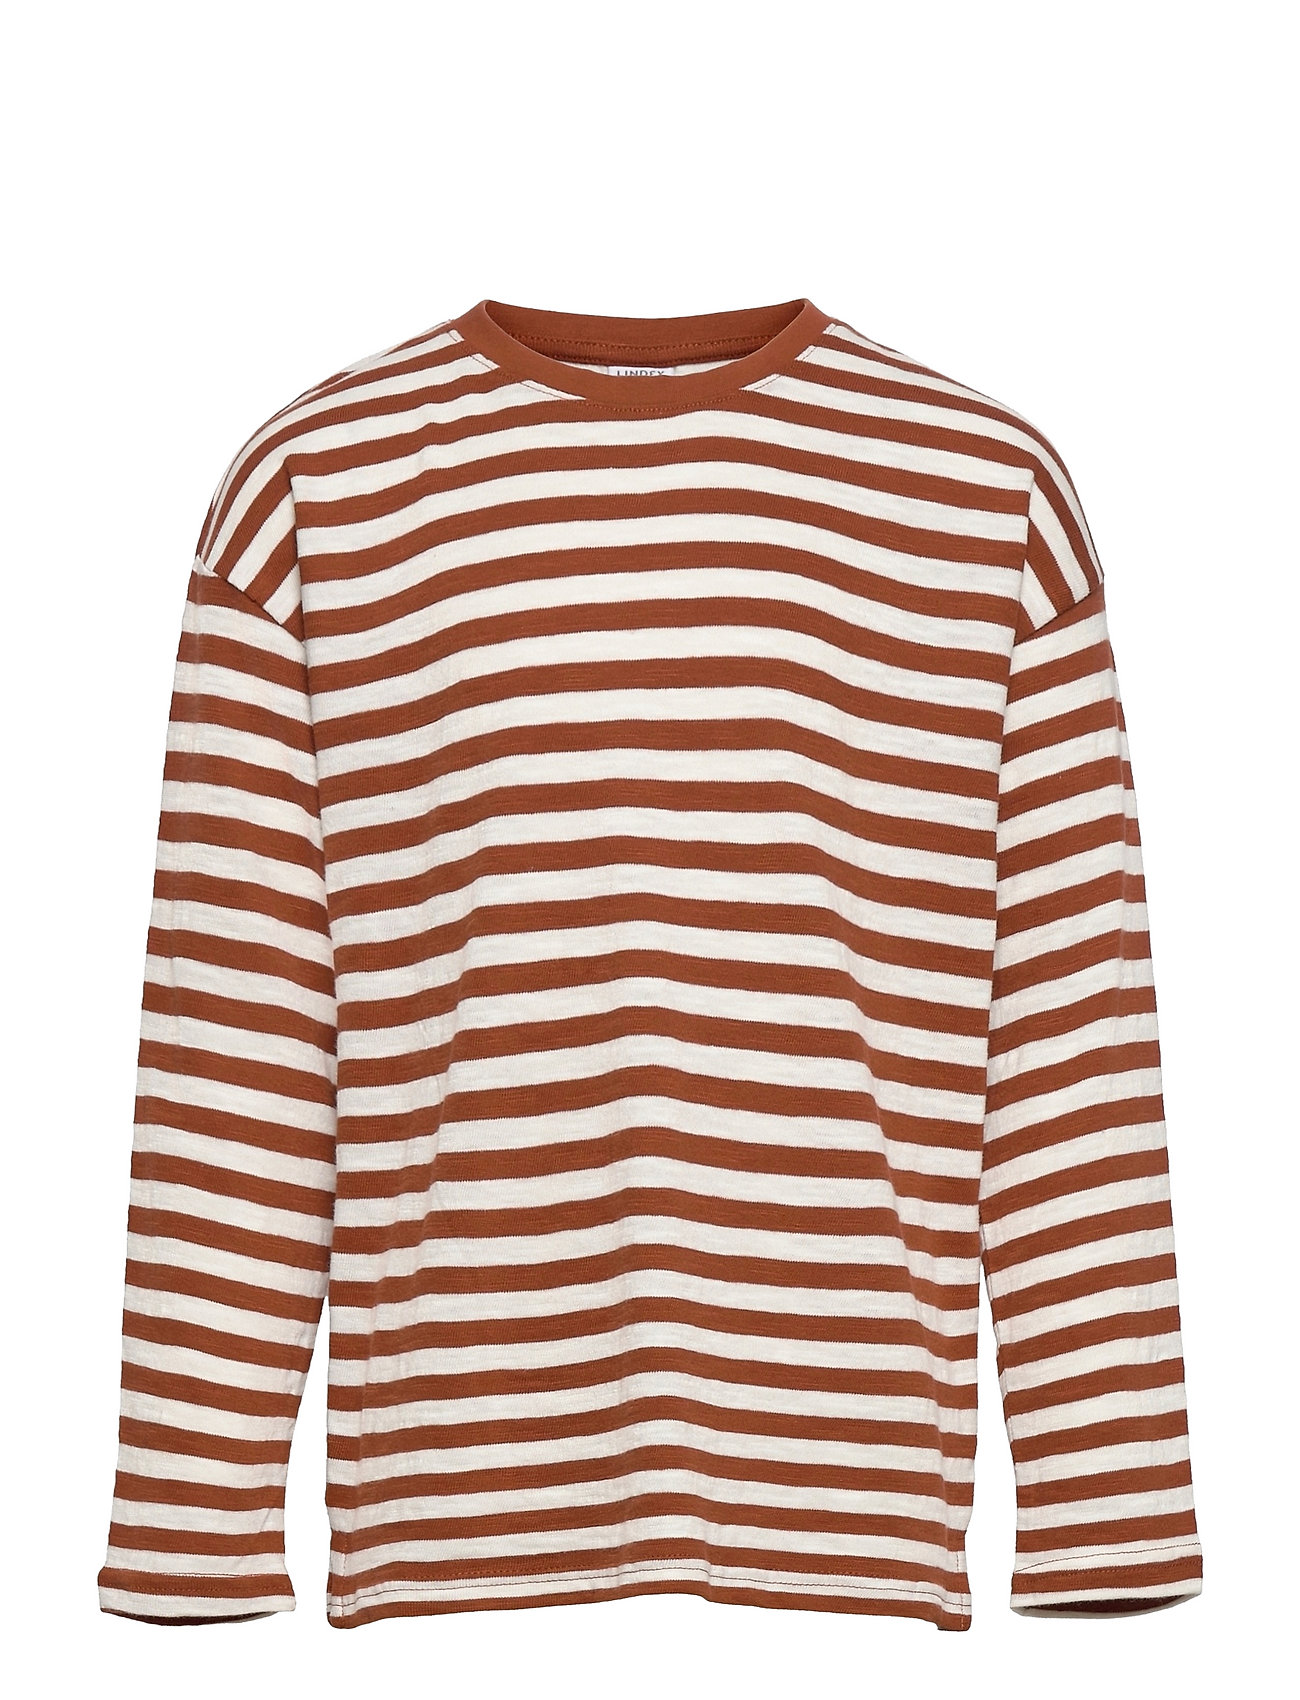 Top Ls Essential Stripe Langærmet T-shirt Orange Lindex